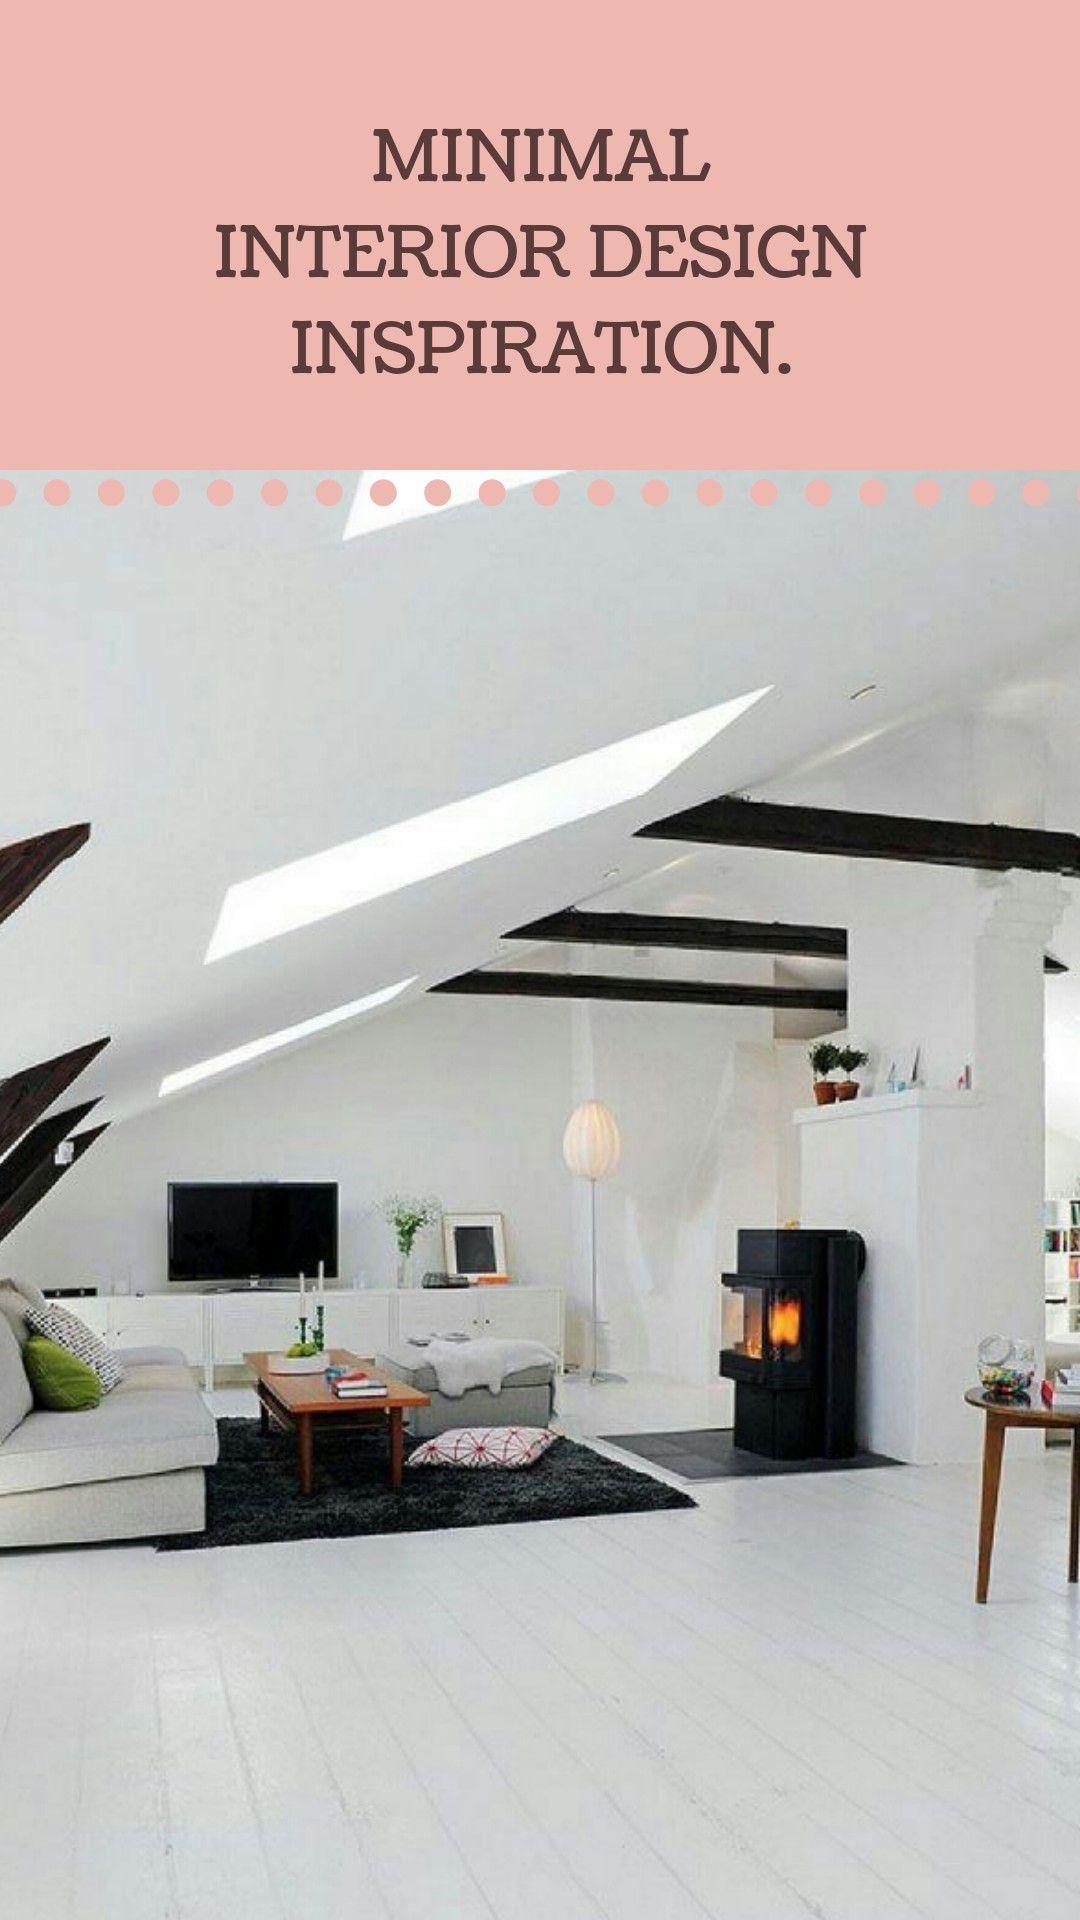 minimal interior design inspiration my home is my imaginarium rh pinterest com